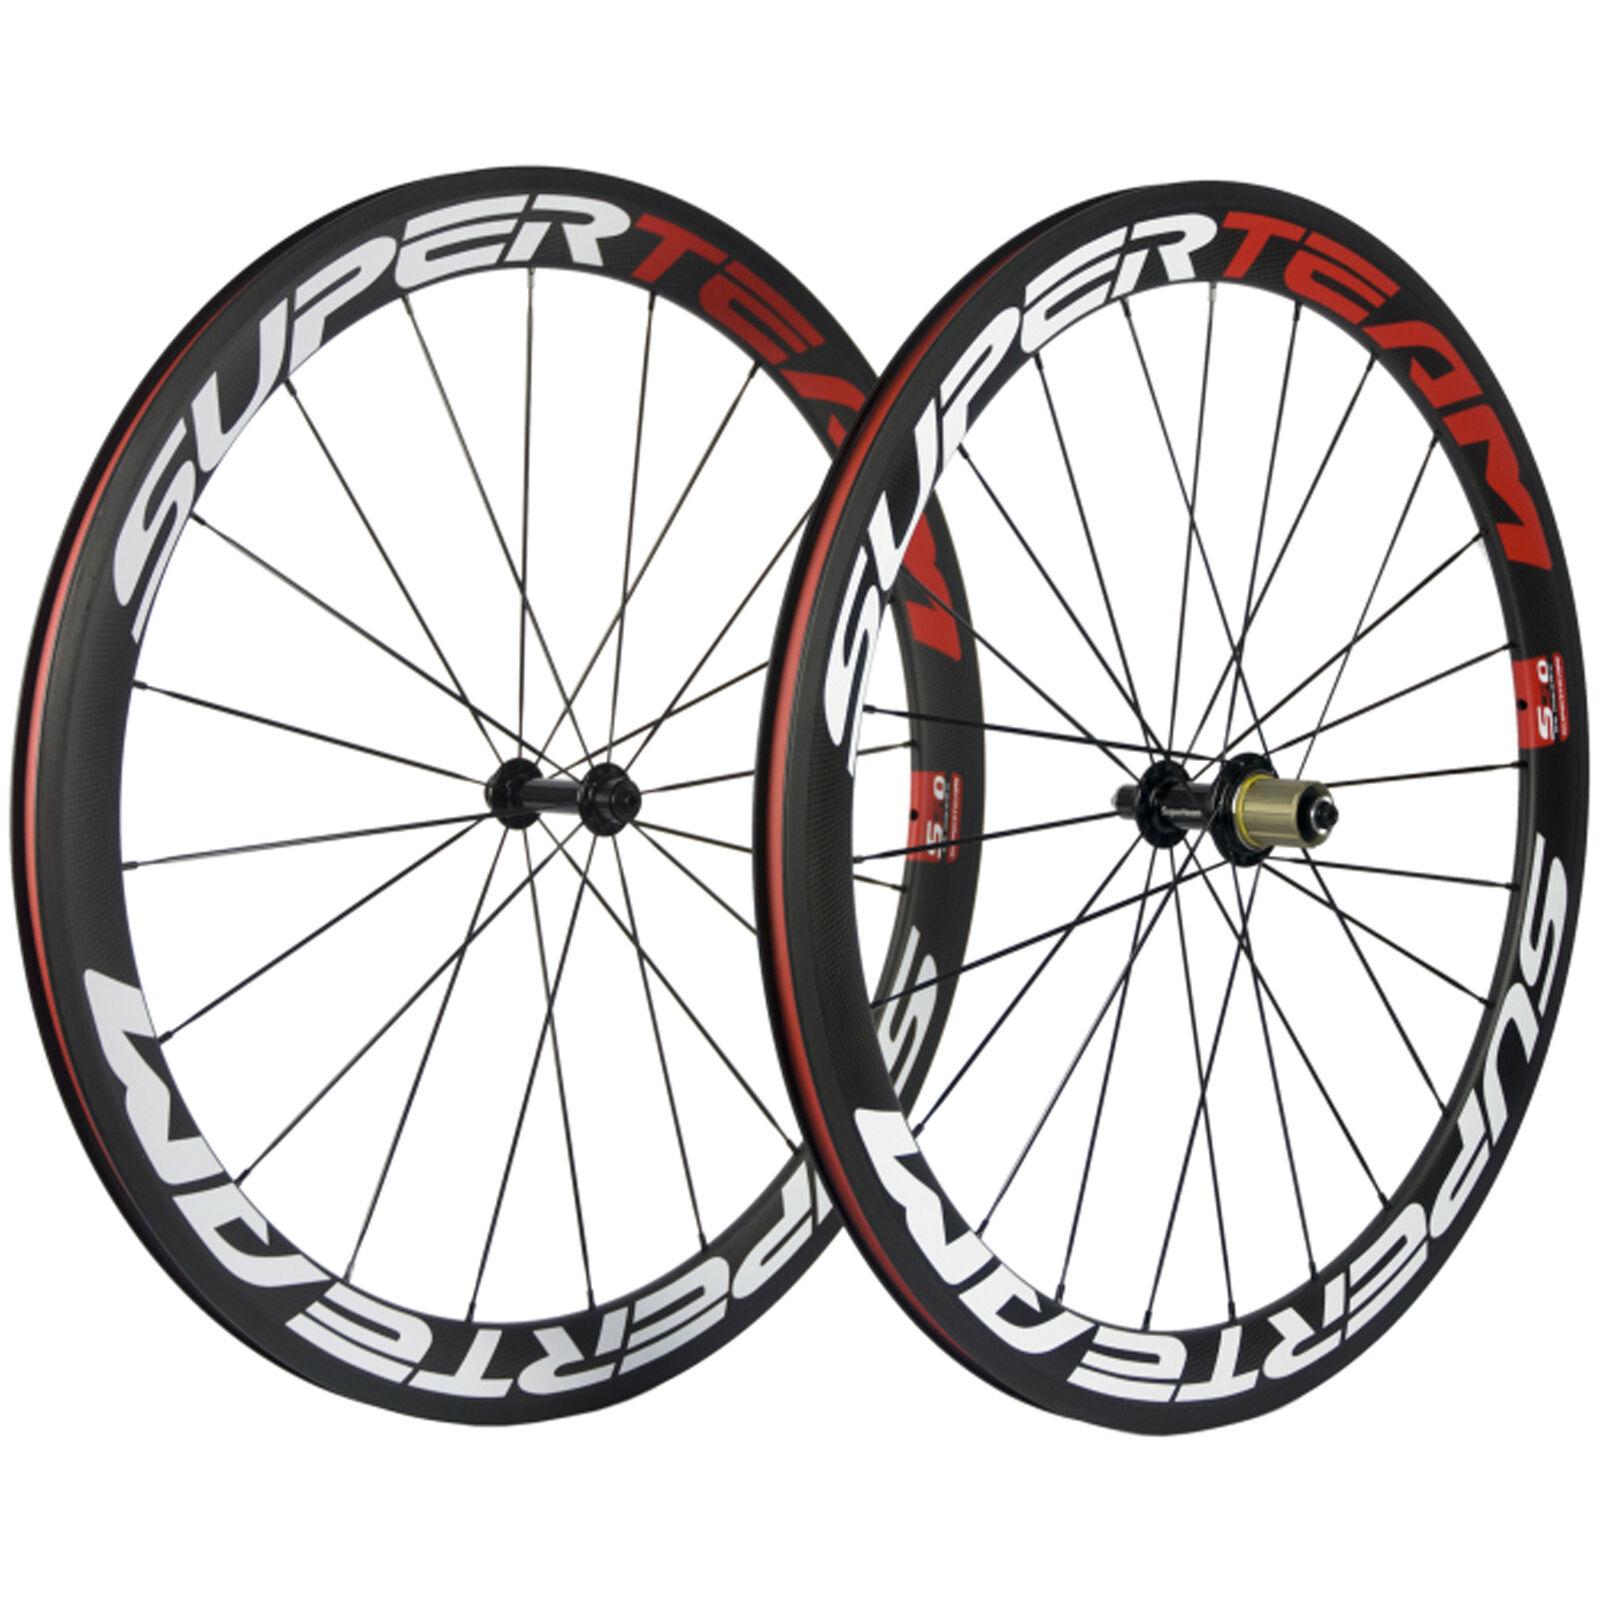 Basalt Brake Surface Road Bike Carbon Wheelset 50mm Clincher Carbon Wheels R13